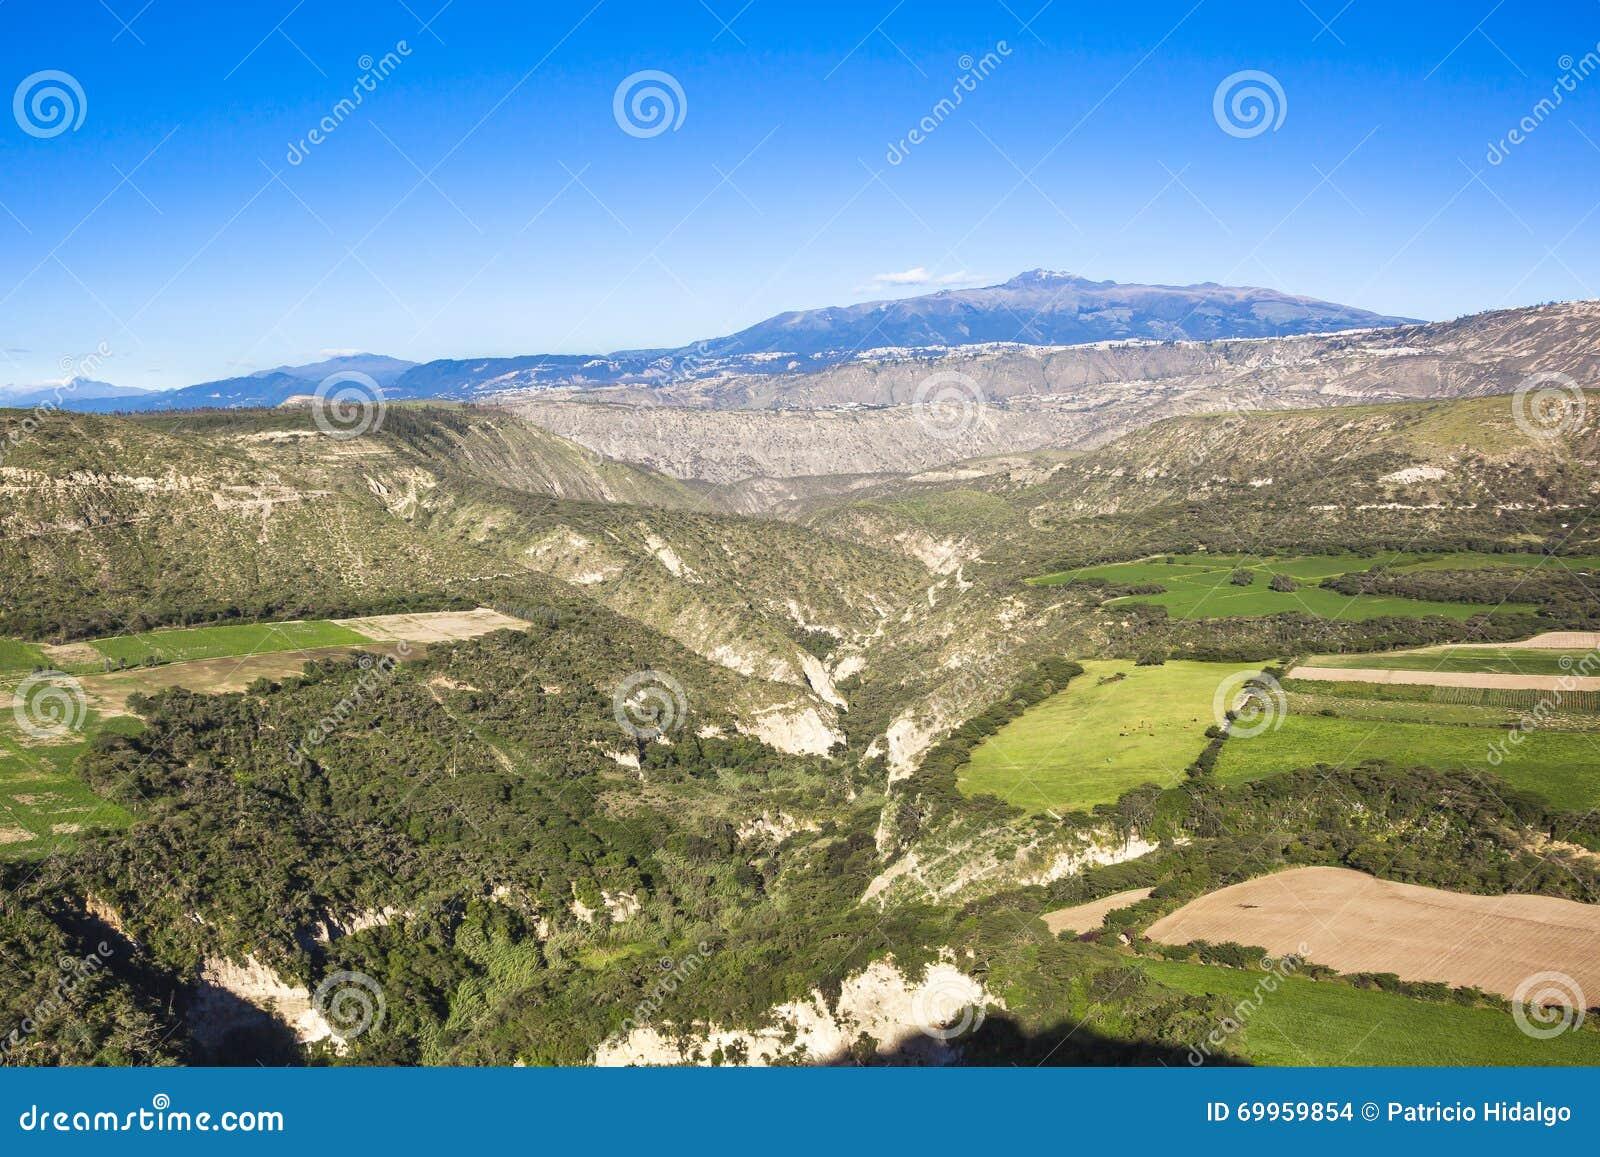 Horas tempranas del valle de guayllabamba de la ma ana for Dreamhome com